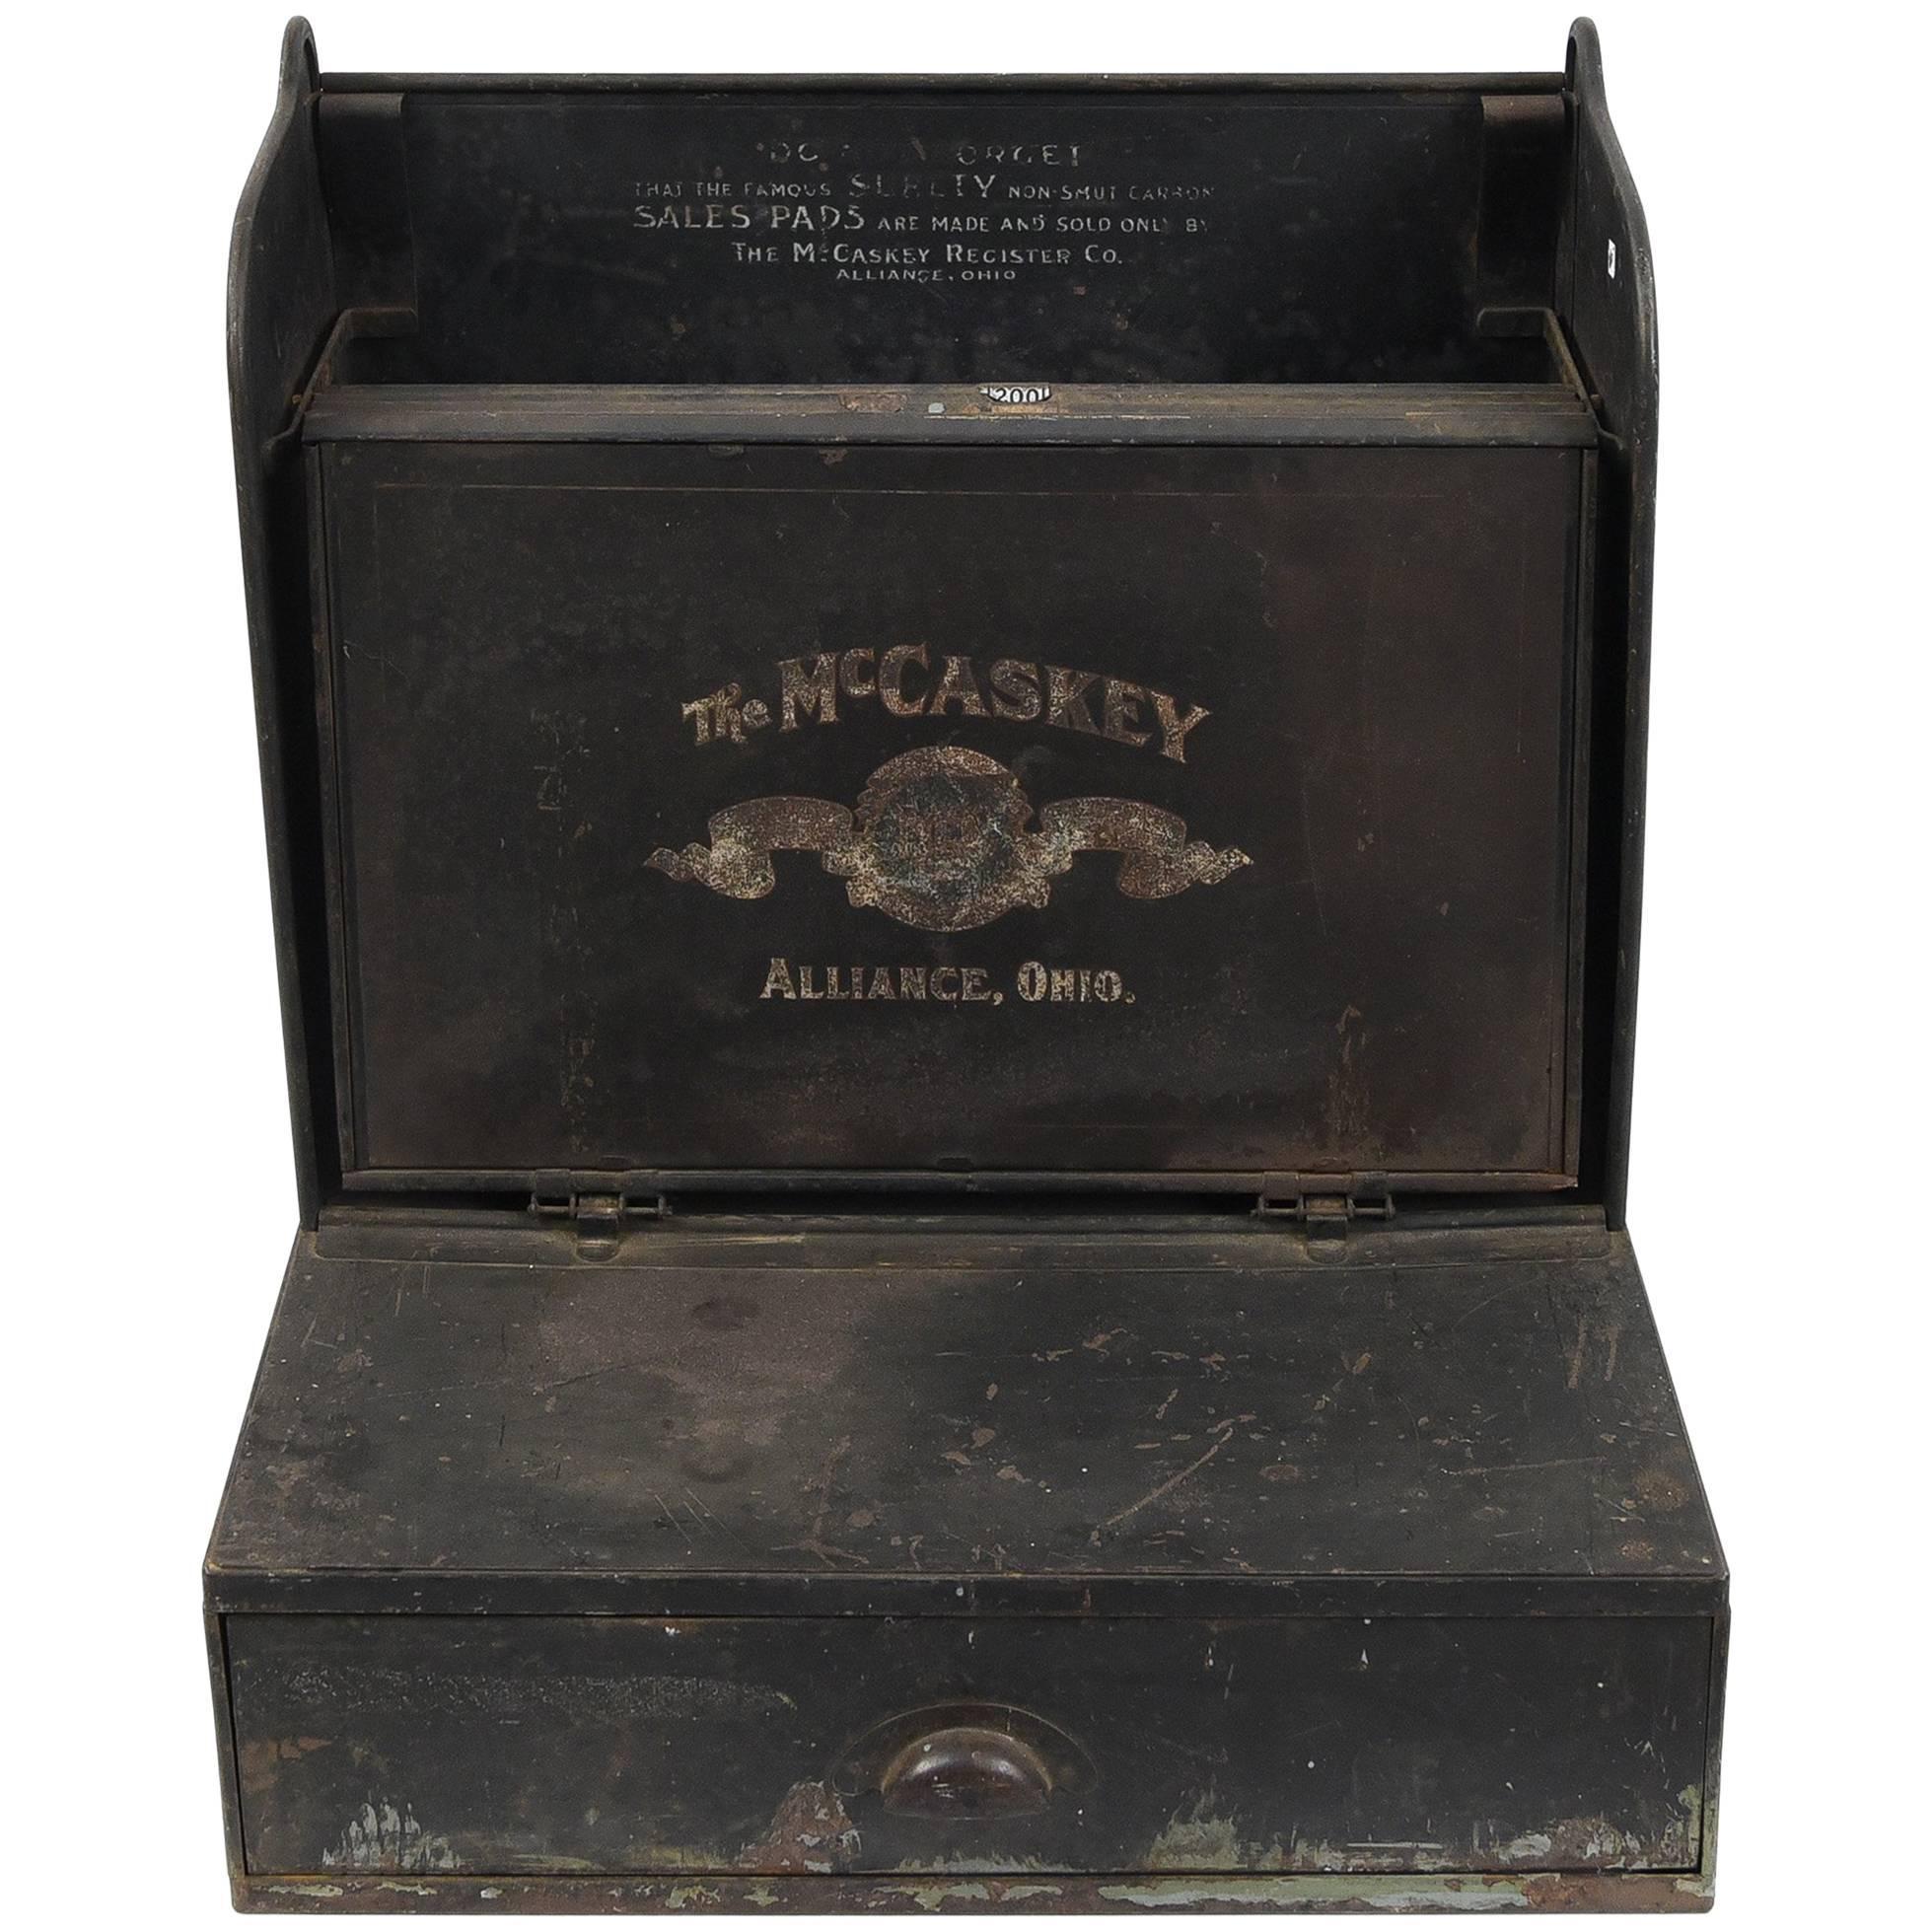 Antique Industrial McCaskey Register Co. Cash Register